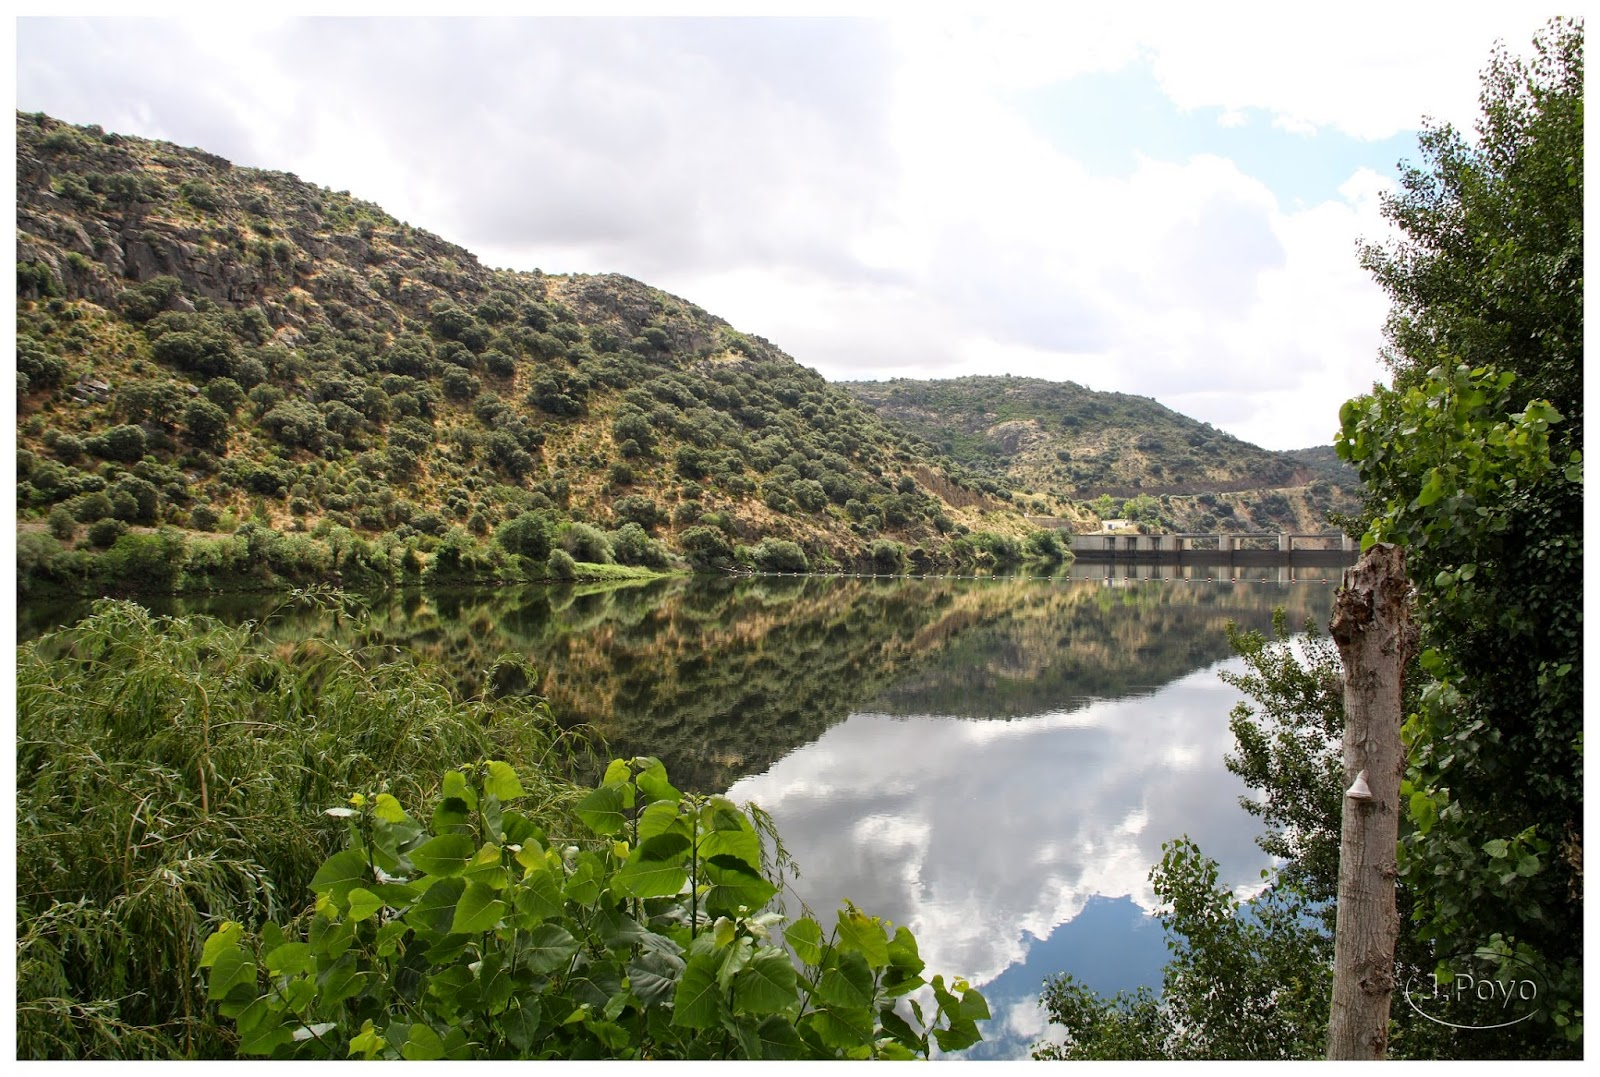 Río Duero, Miranda do Douro, estación ambiental